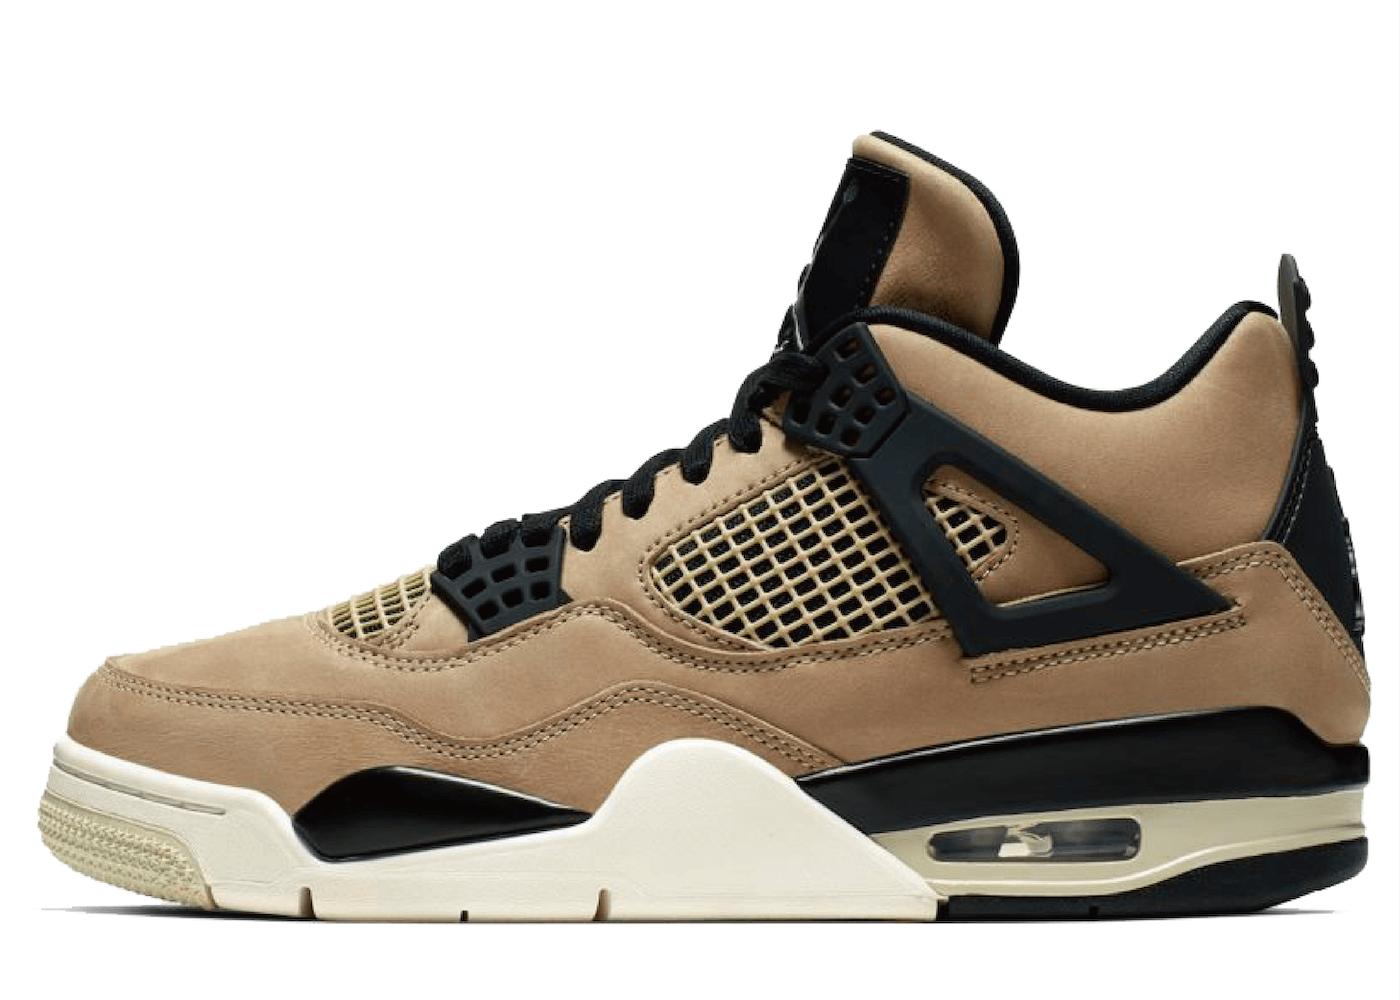 Nike Air Jordan 4 Retro Fossil Women'sの写真